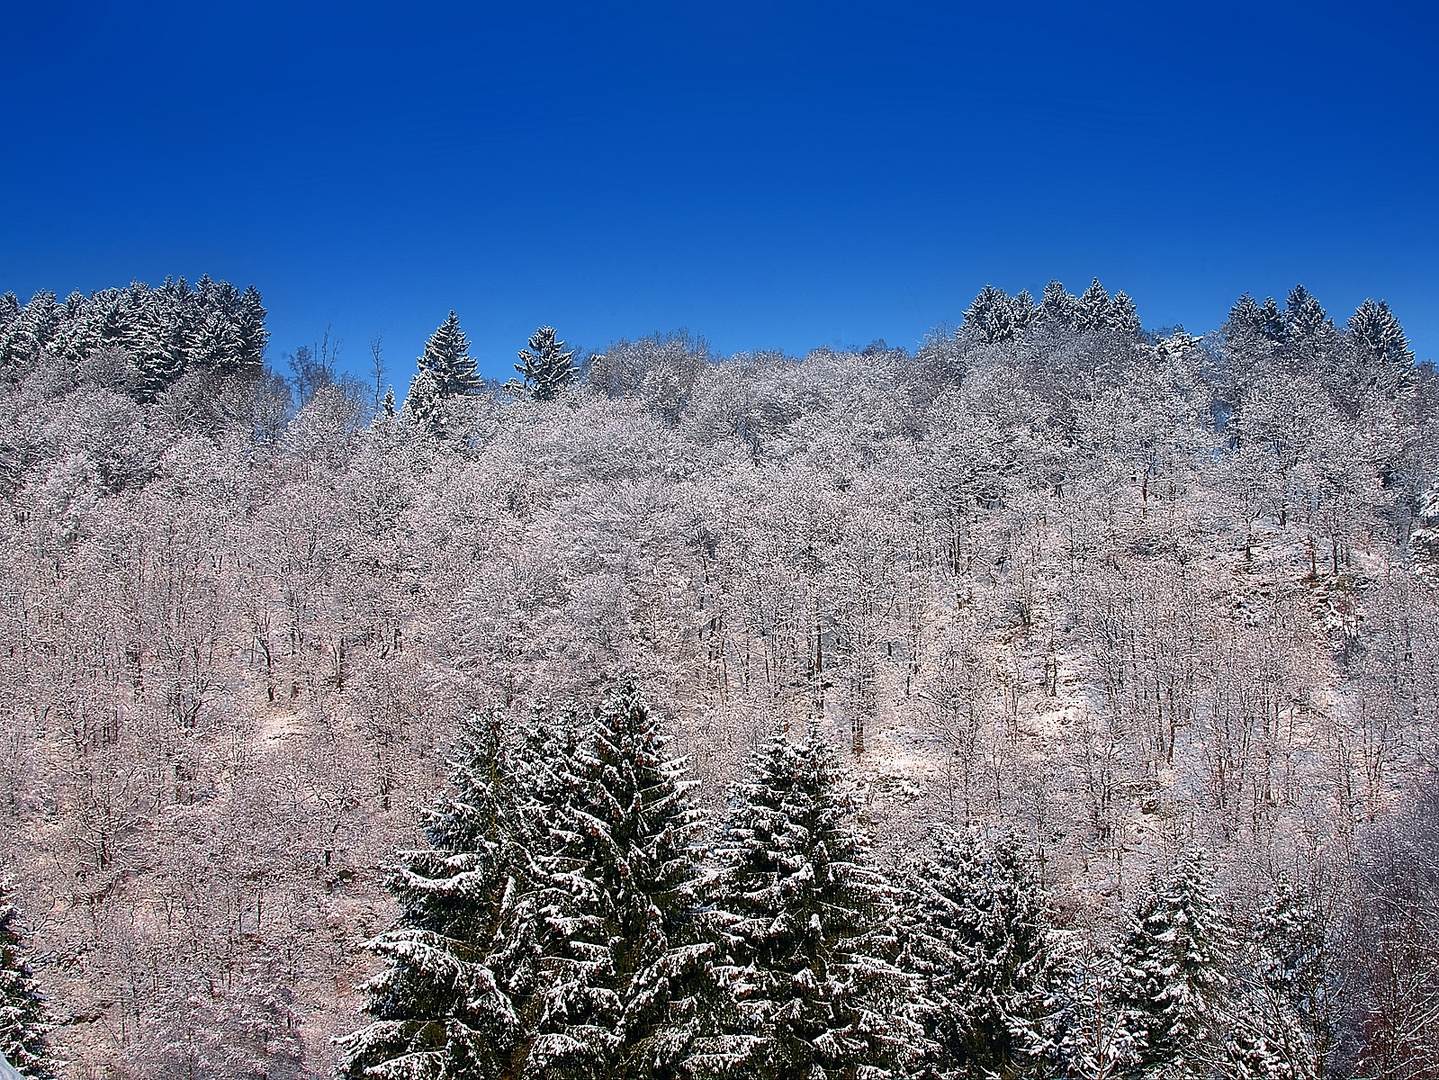 Die Hügel entlang der Wupperschleife